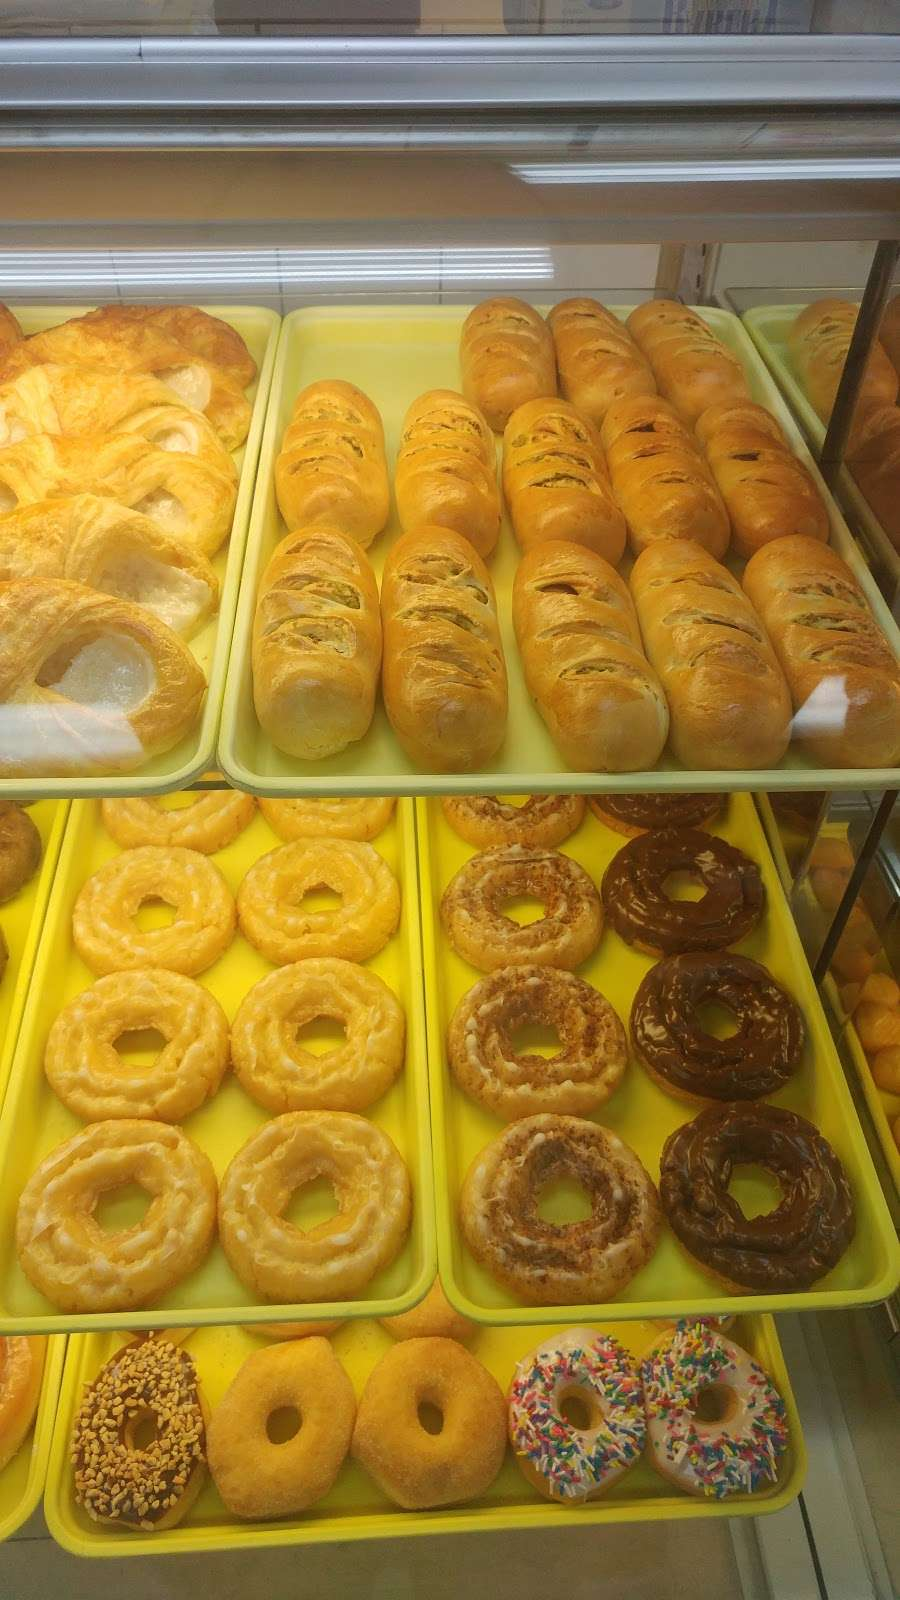 Donut Plaza - bakery    Photo 6 of 10   Address: 1745 N Country Club Rd, Garland, TX 75040, USA   Phone: (972) 272-7339